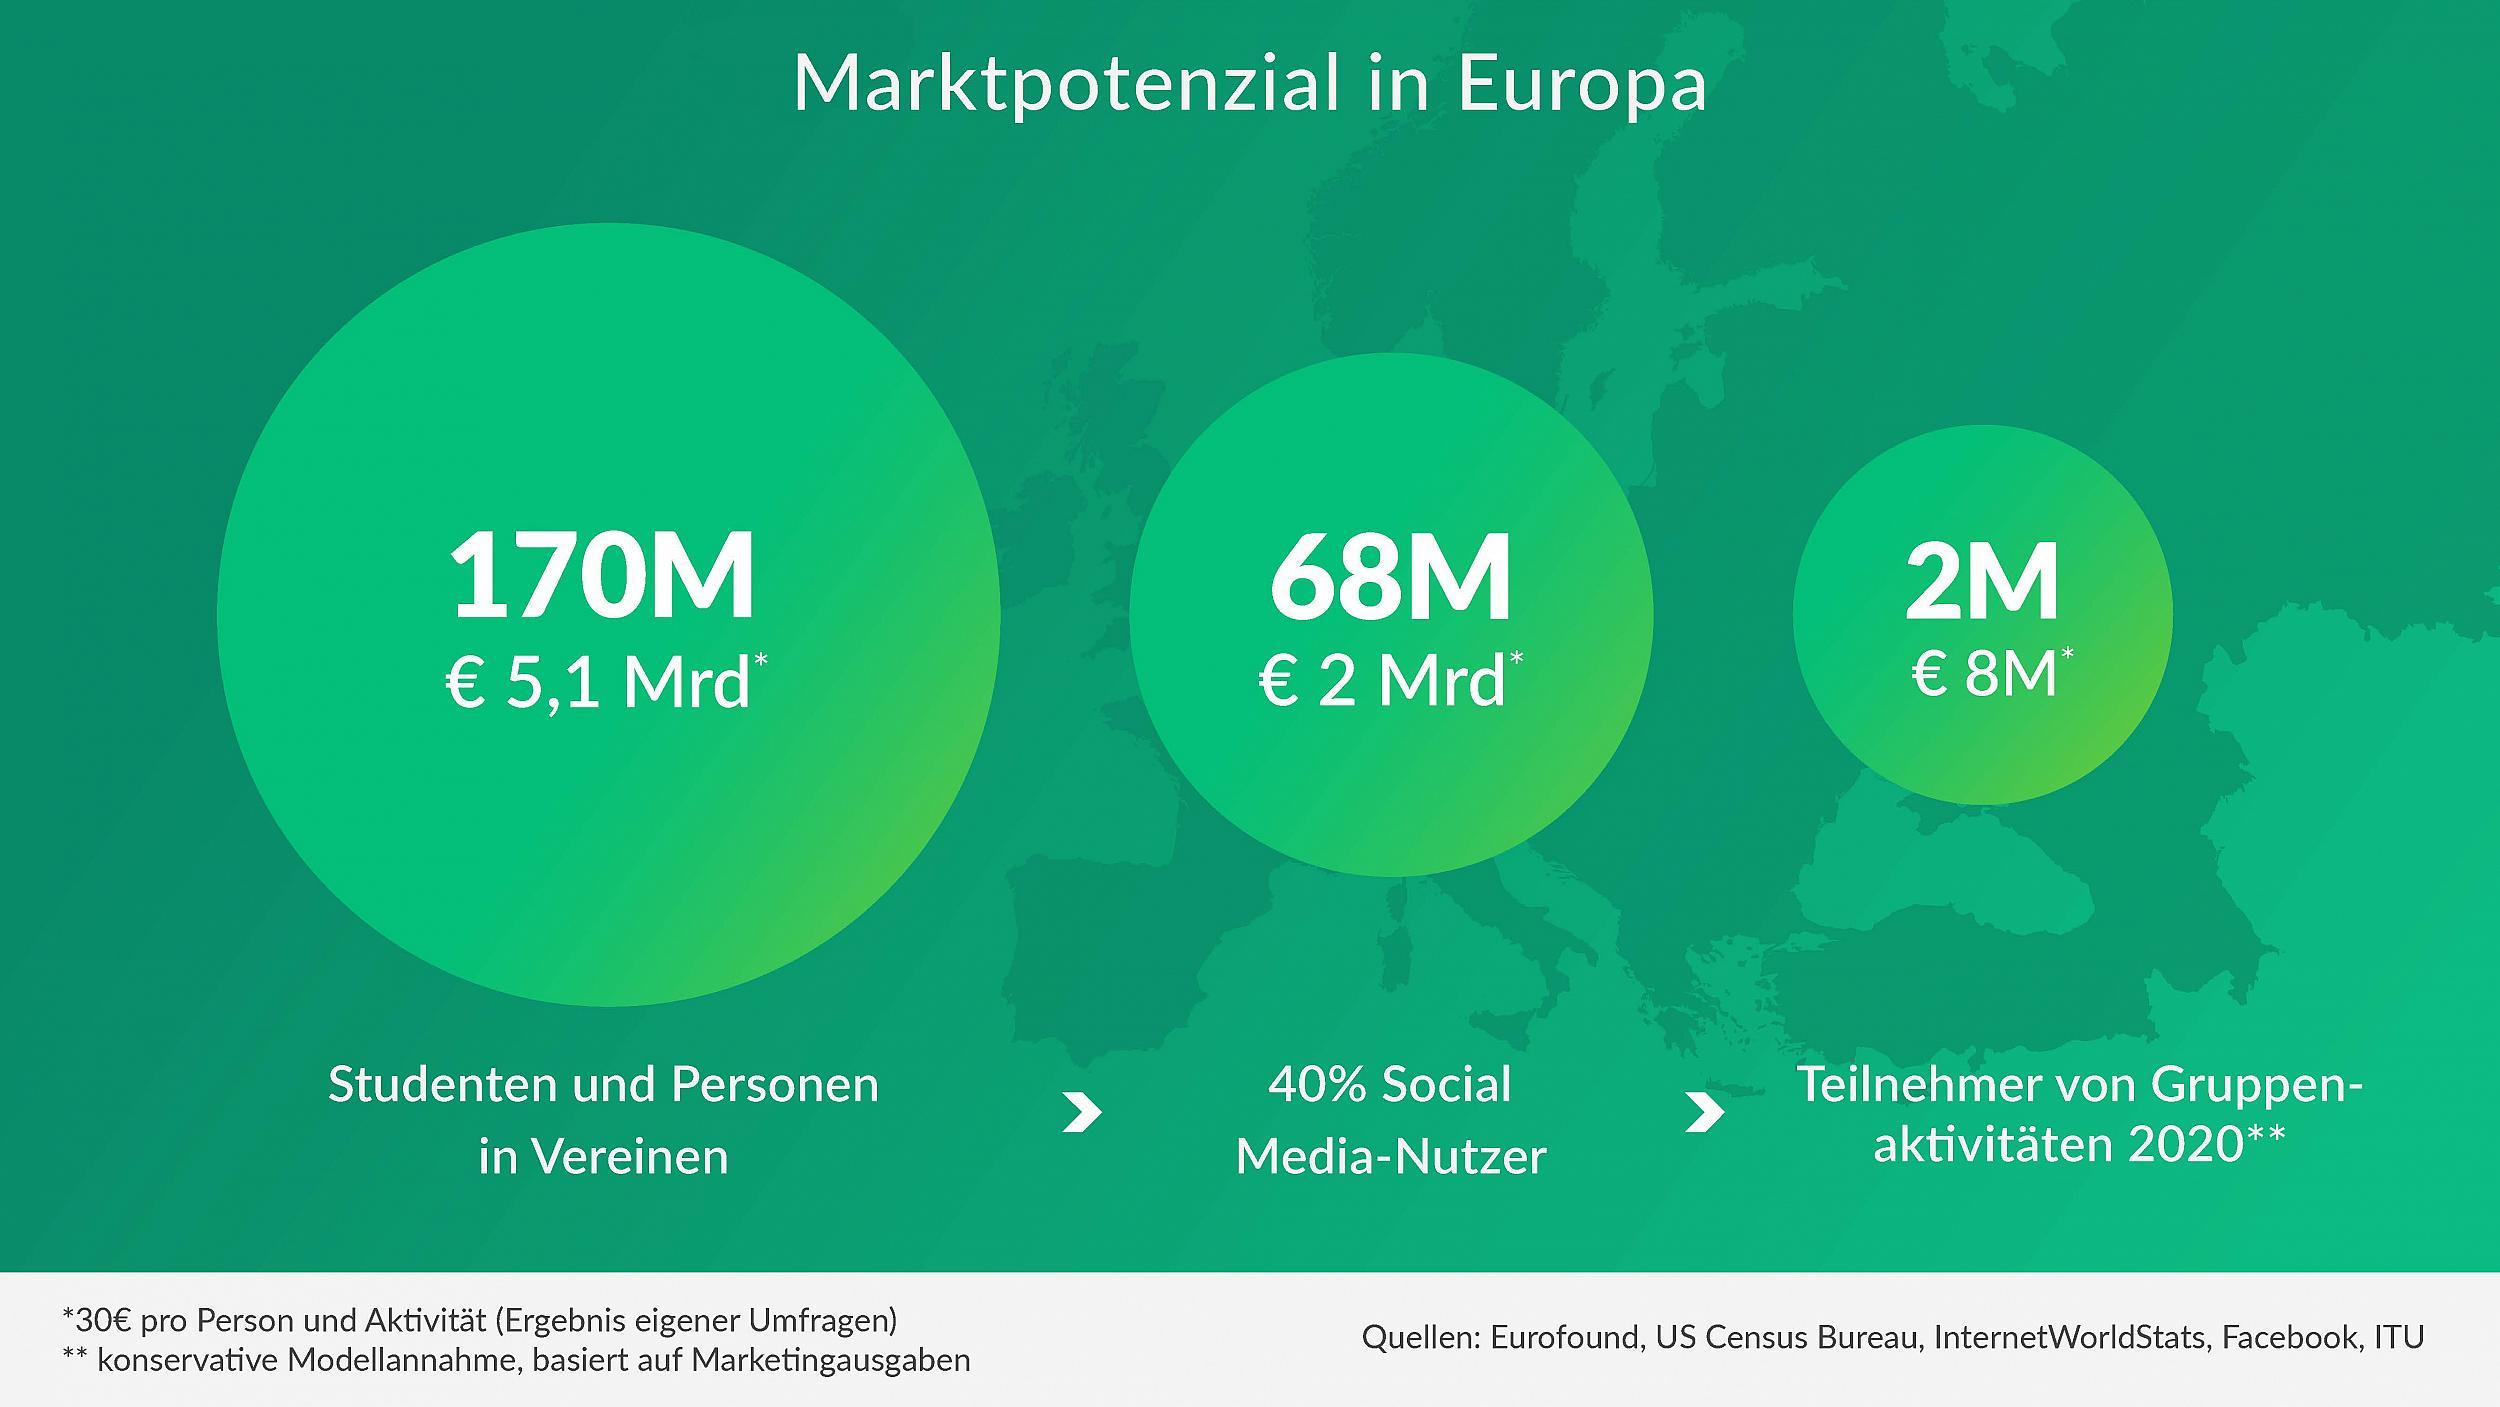 GroopDoo - Marktpotenzial in Europa